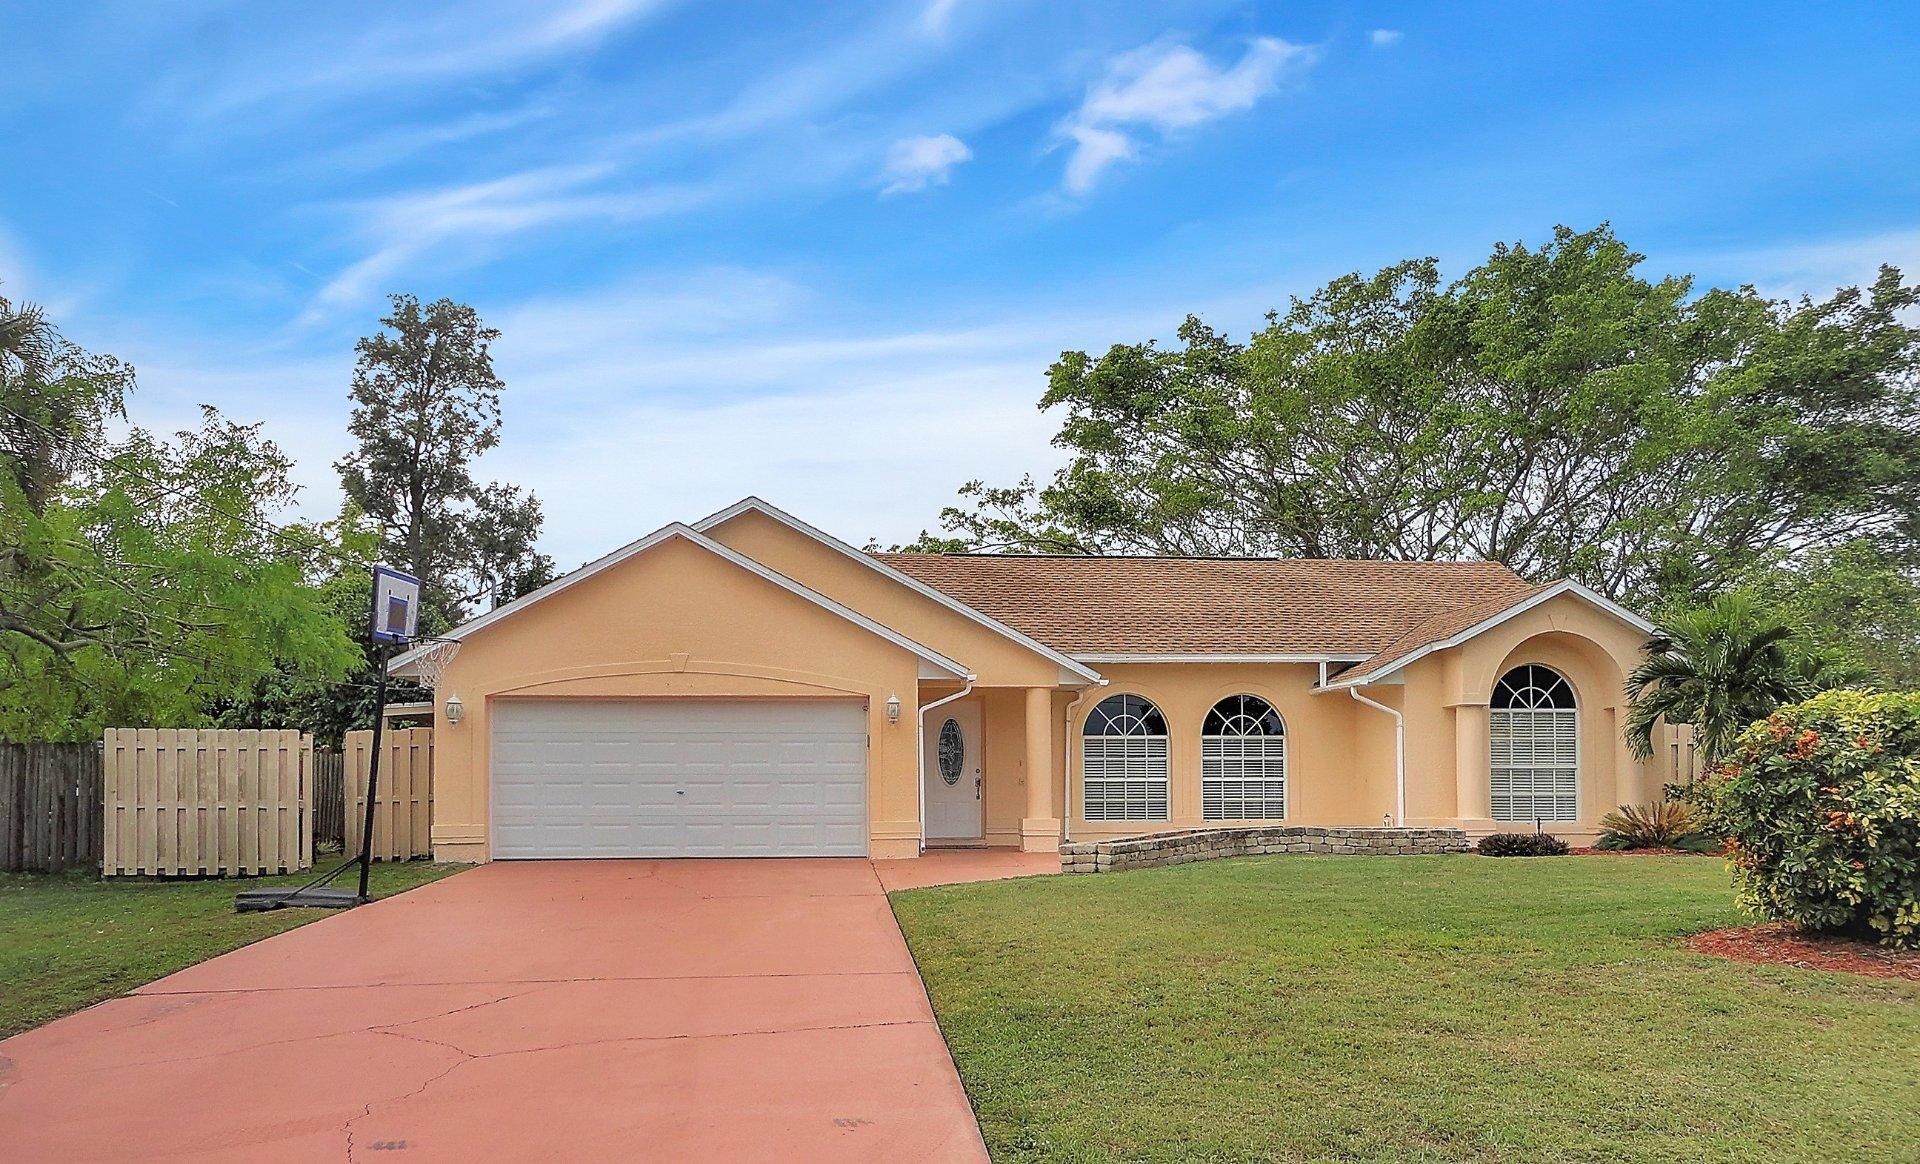 2574 SE Perugia Street - Port St Lucie, Florida